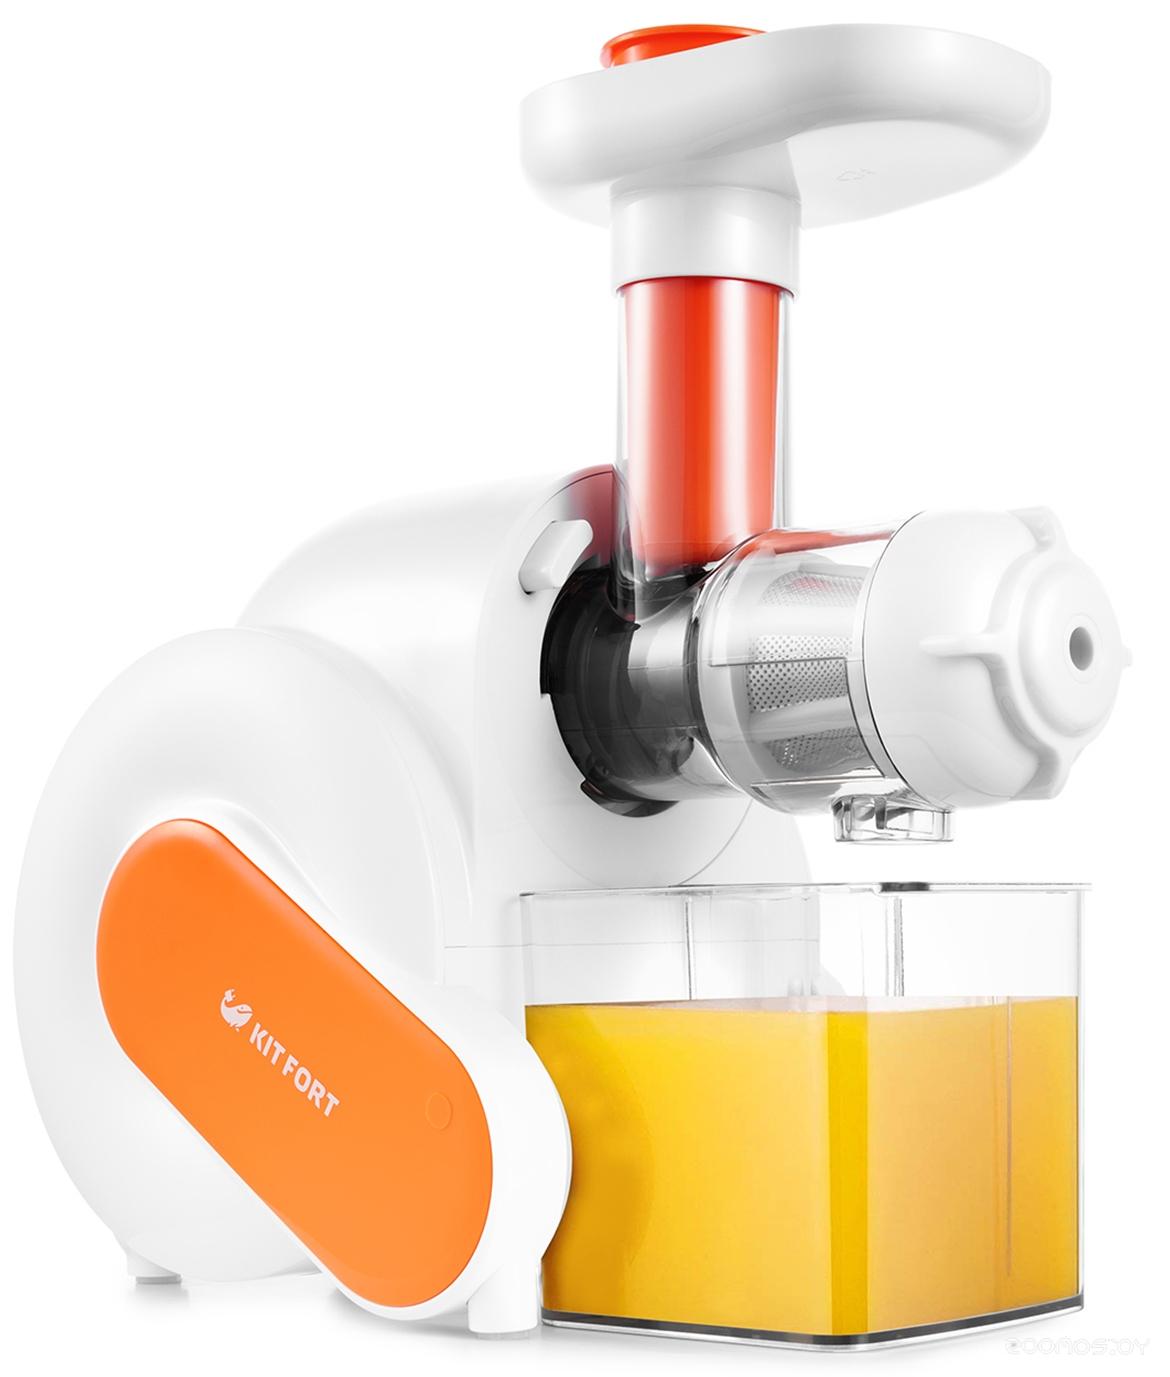 Соковыжималка Kitfort KT-1110-2 (Orange)